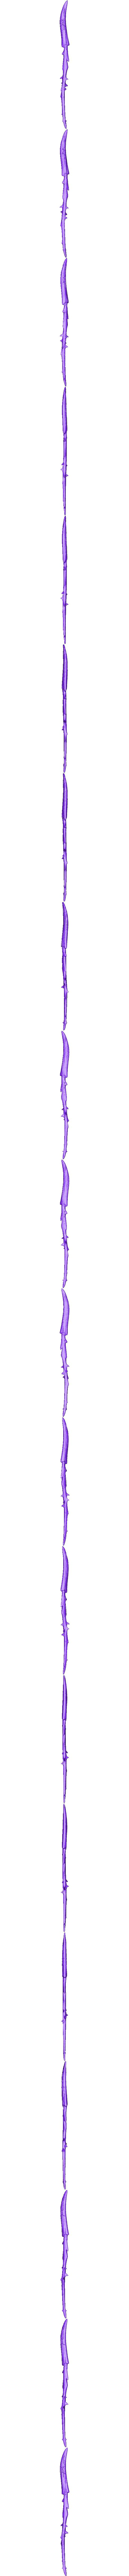 Death Thom Complete.obj Download 3MF file Death Eater Wand (Thorn) Sale • 3D printable object, santuli700